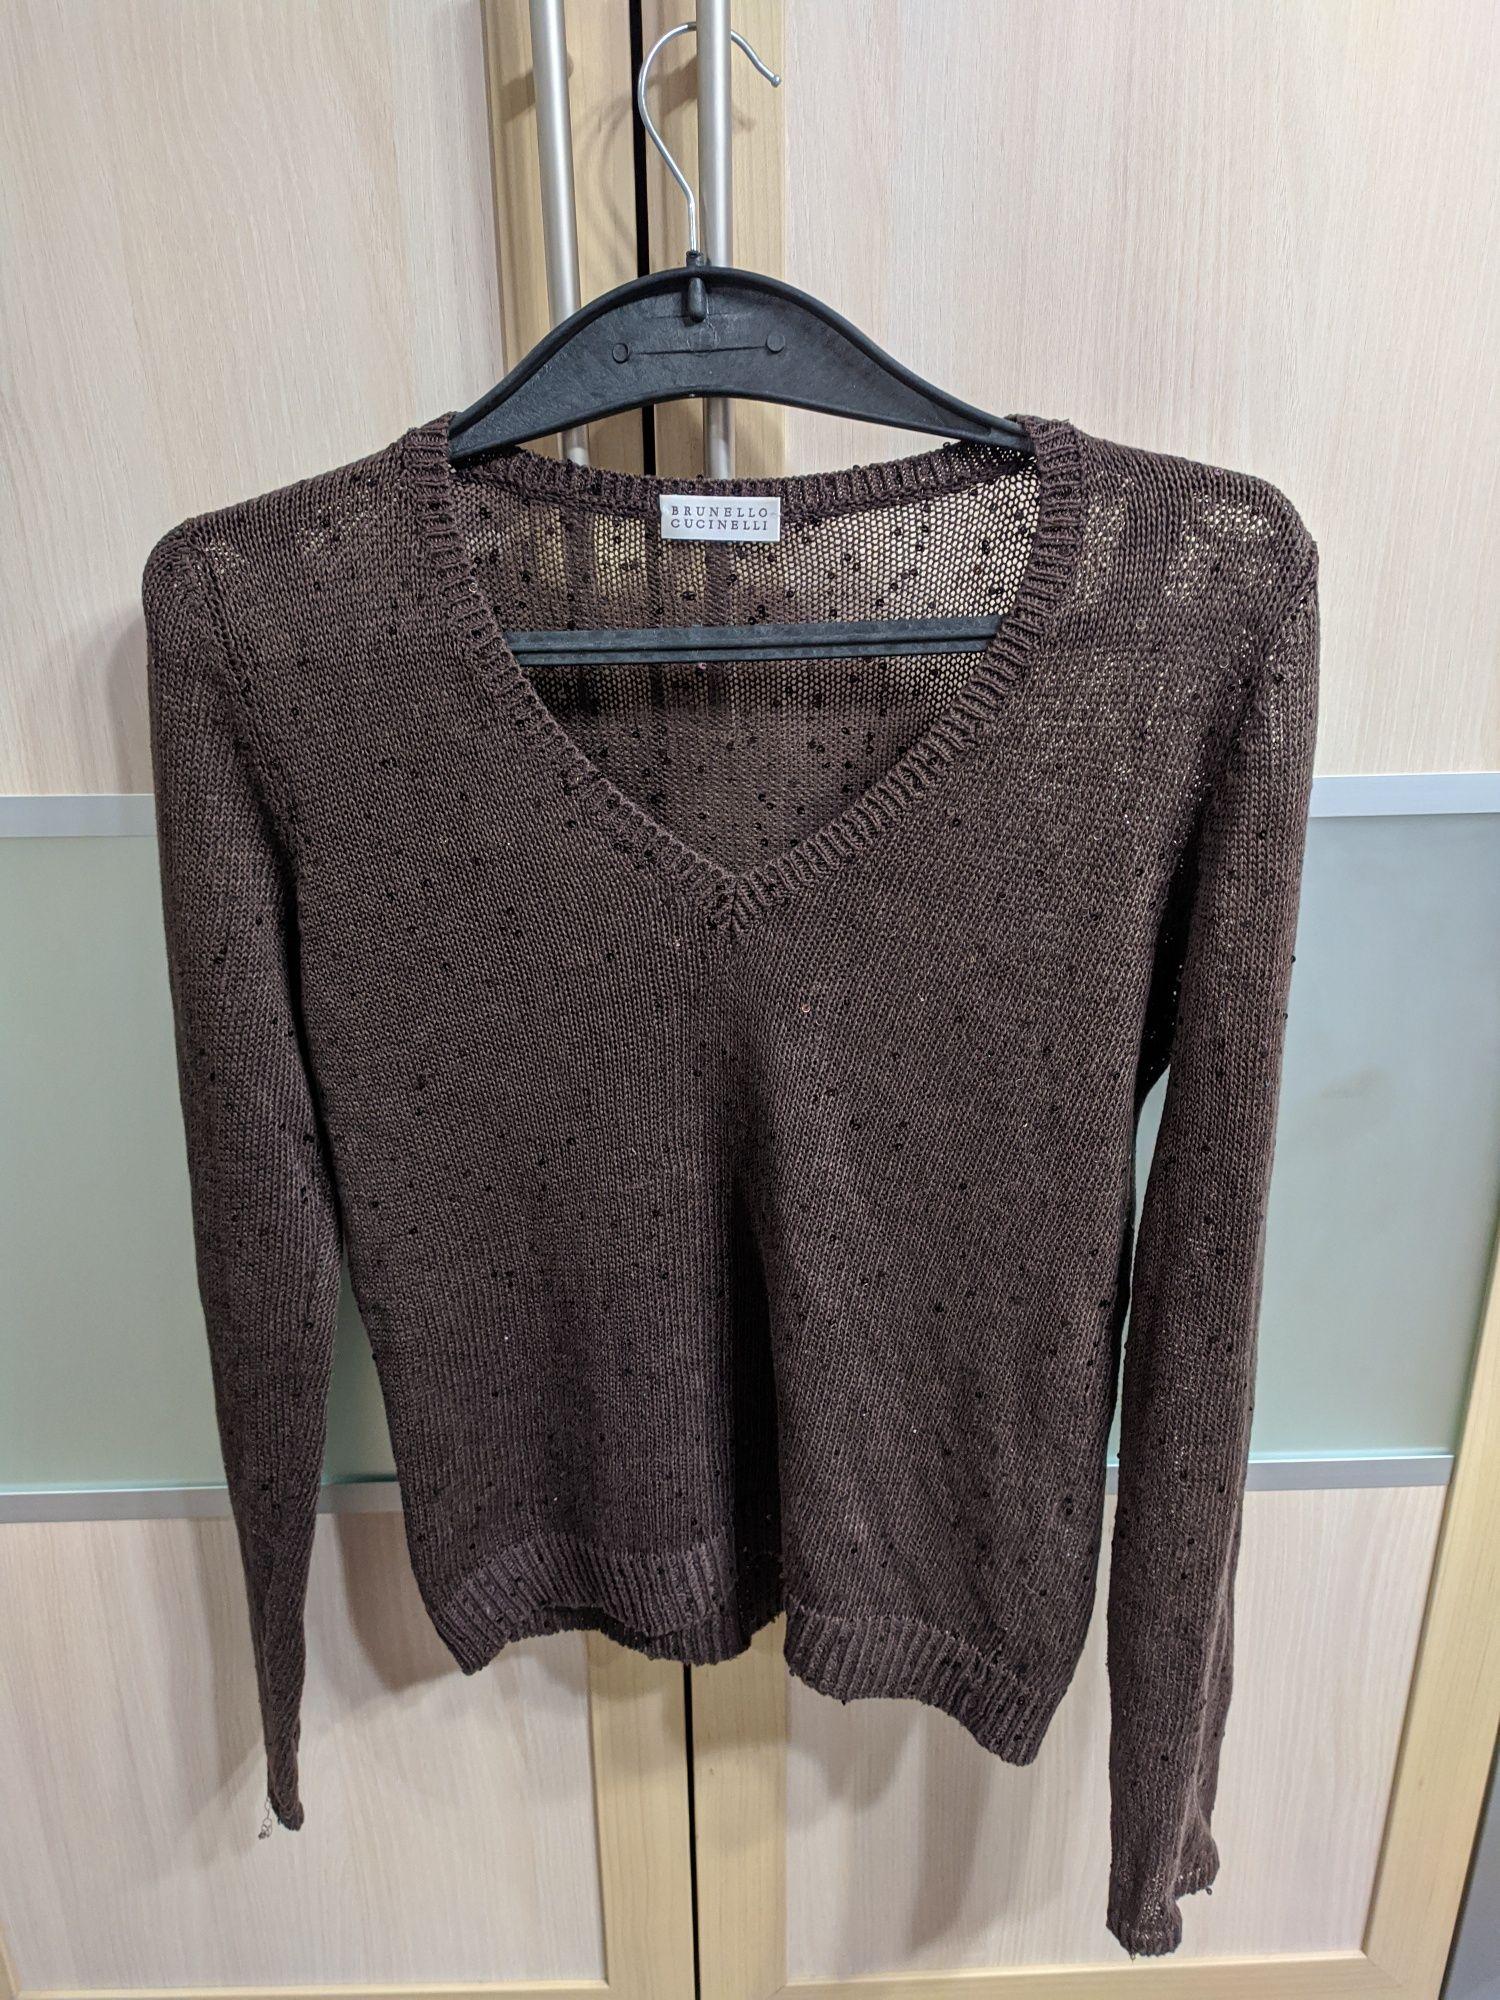 Brunello Cucinelli свитер кофта Джемпер оригинал винтаж лён шелк